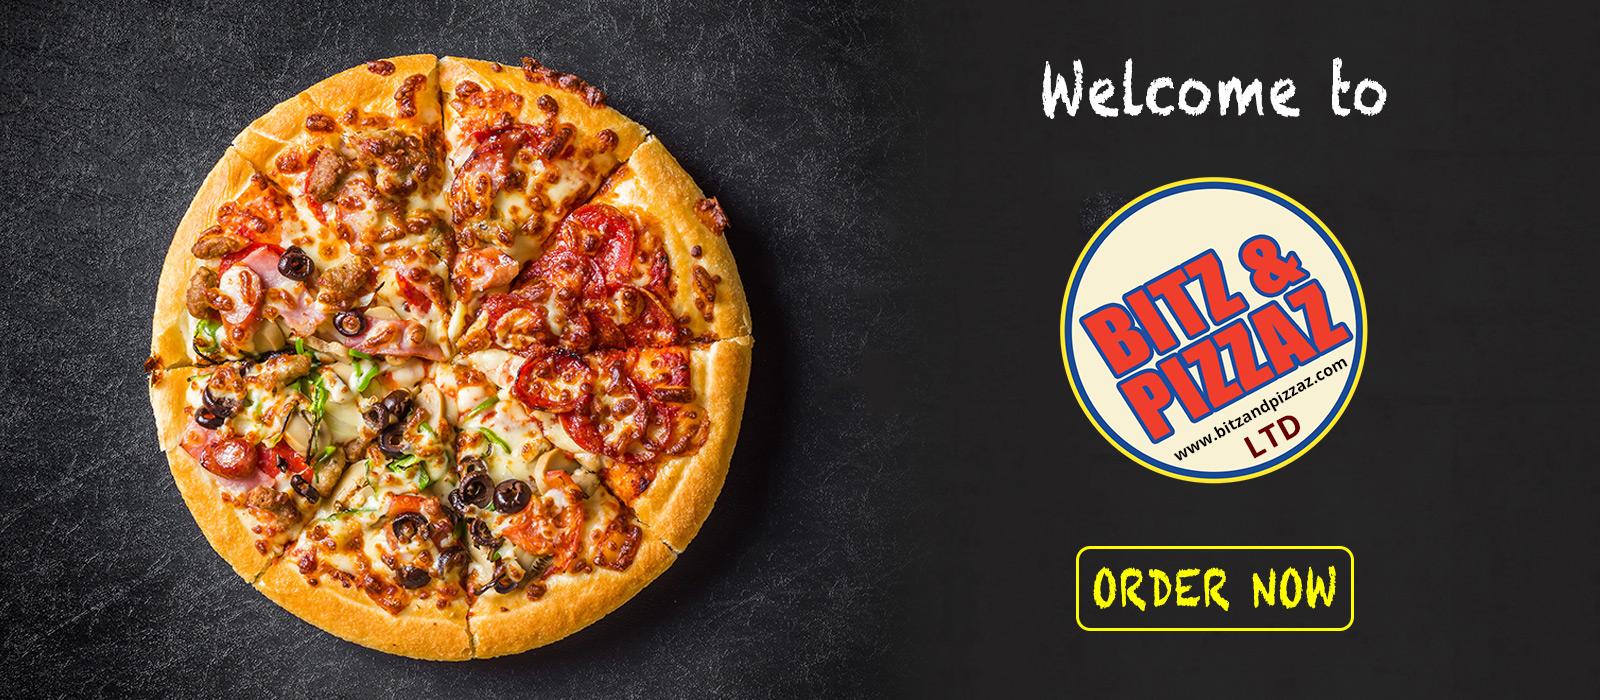 Bitz And Pizzaz Bitz And Pizzaz Southampton Southampton